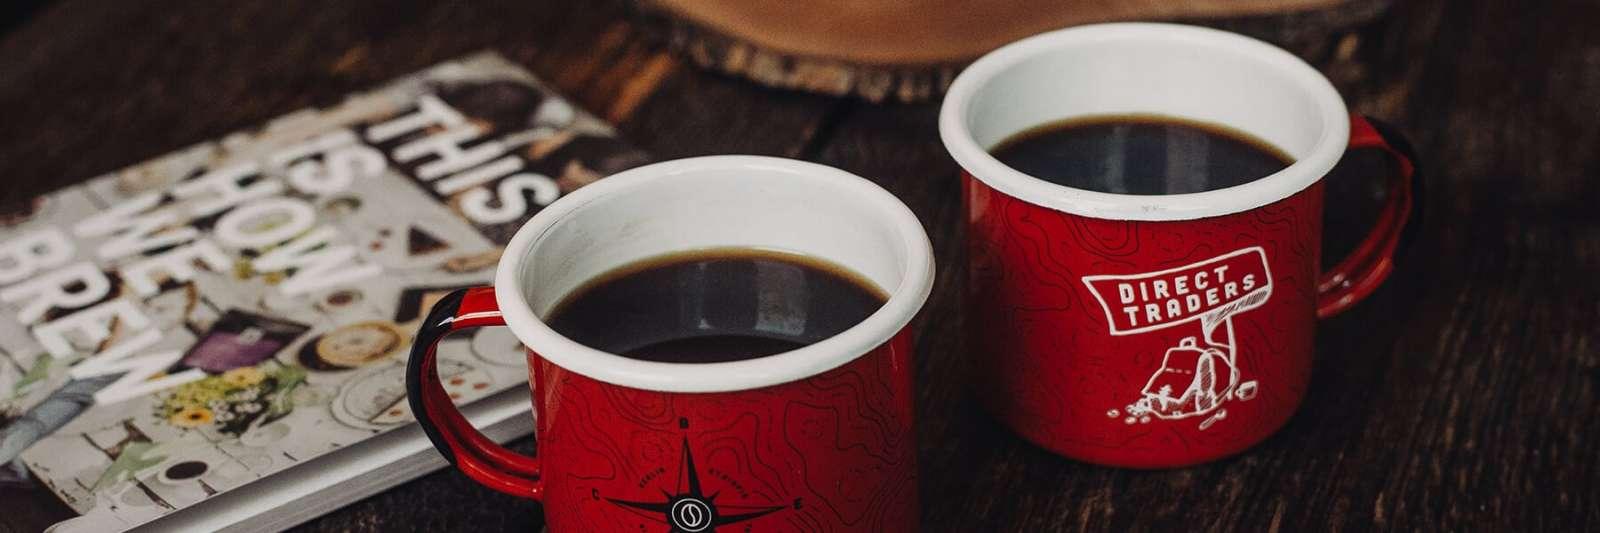 Kaffee-Sets & Angebote